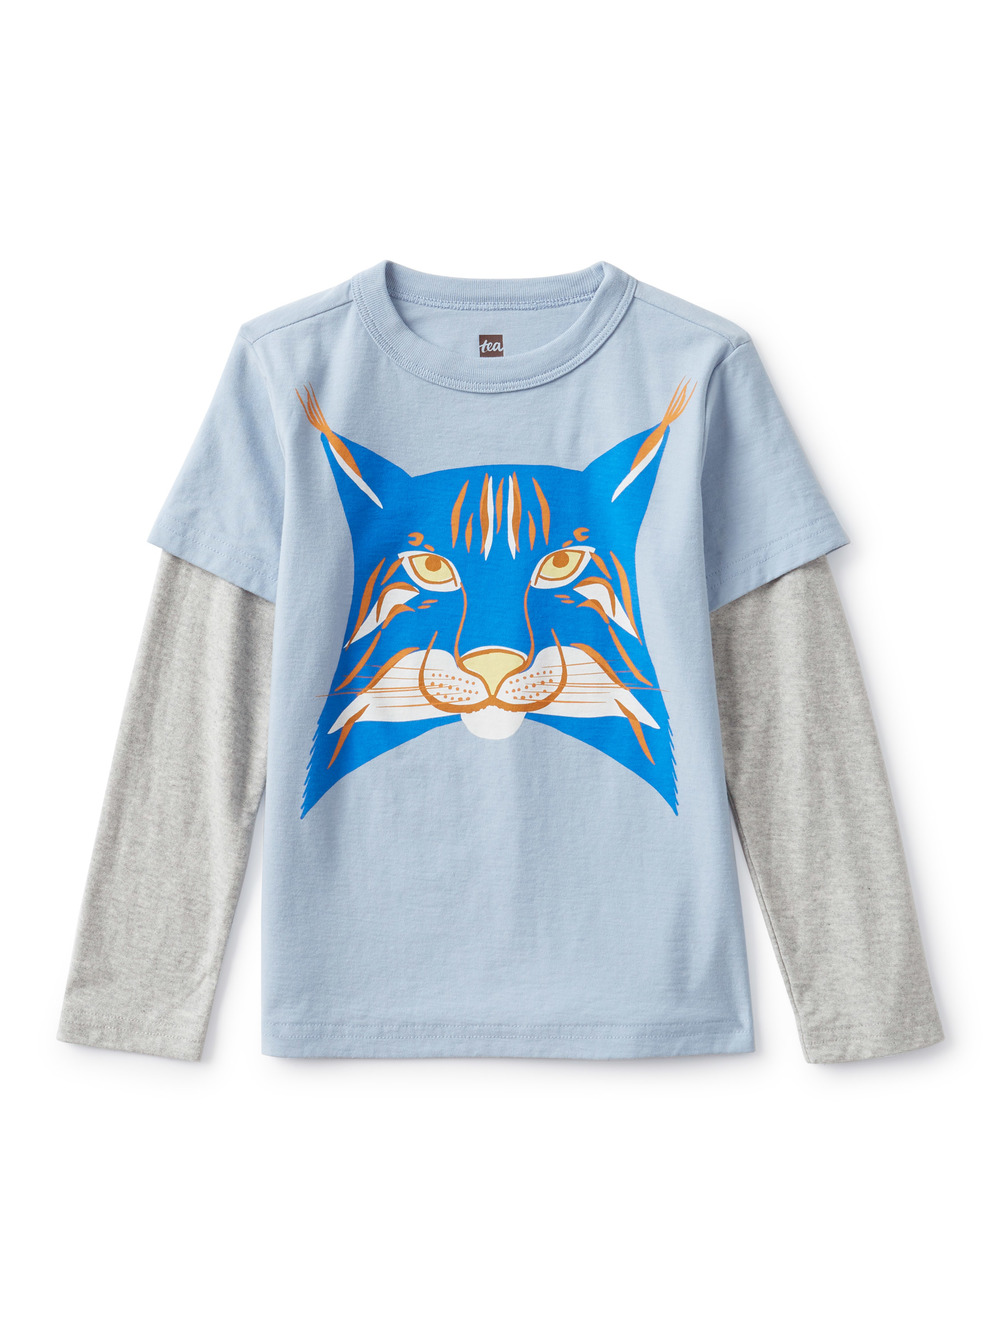 Lynx Layered Graphic Tee